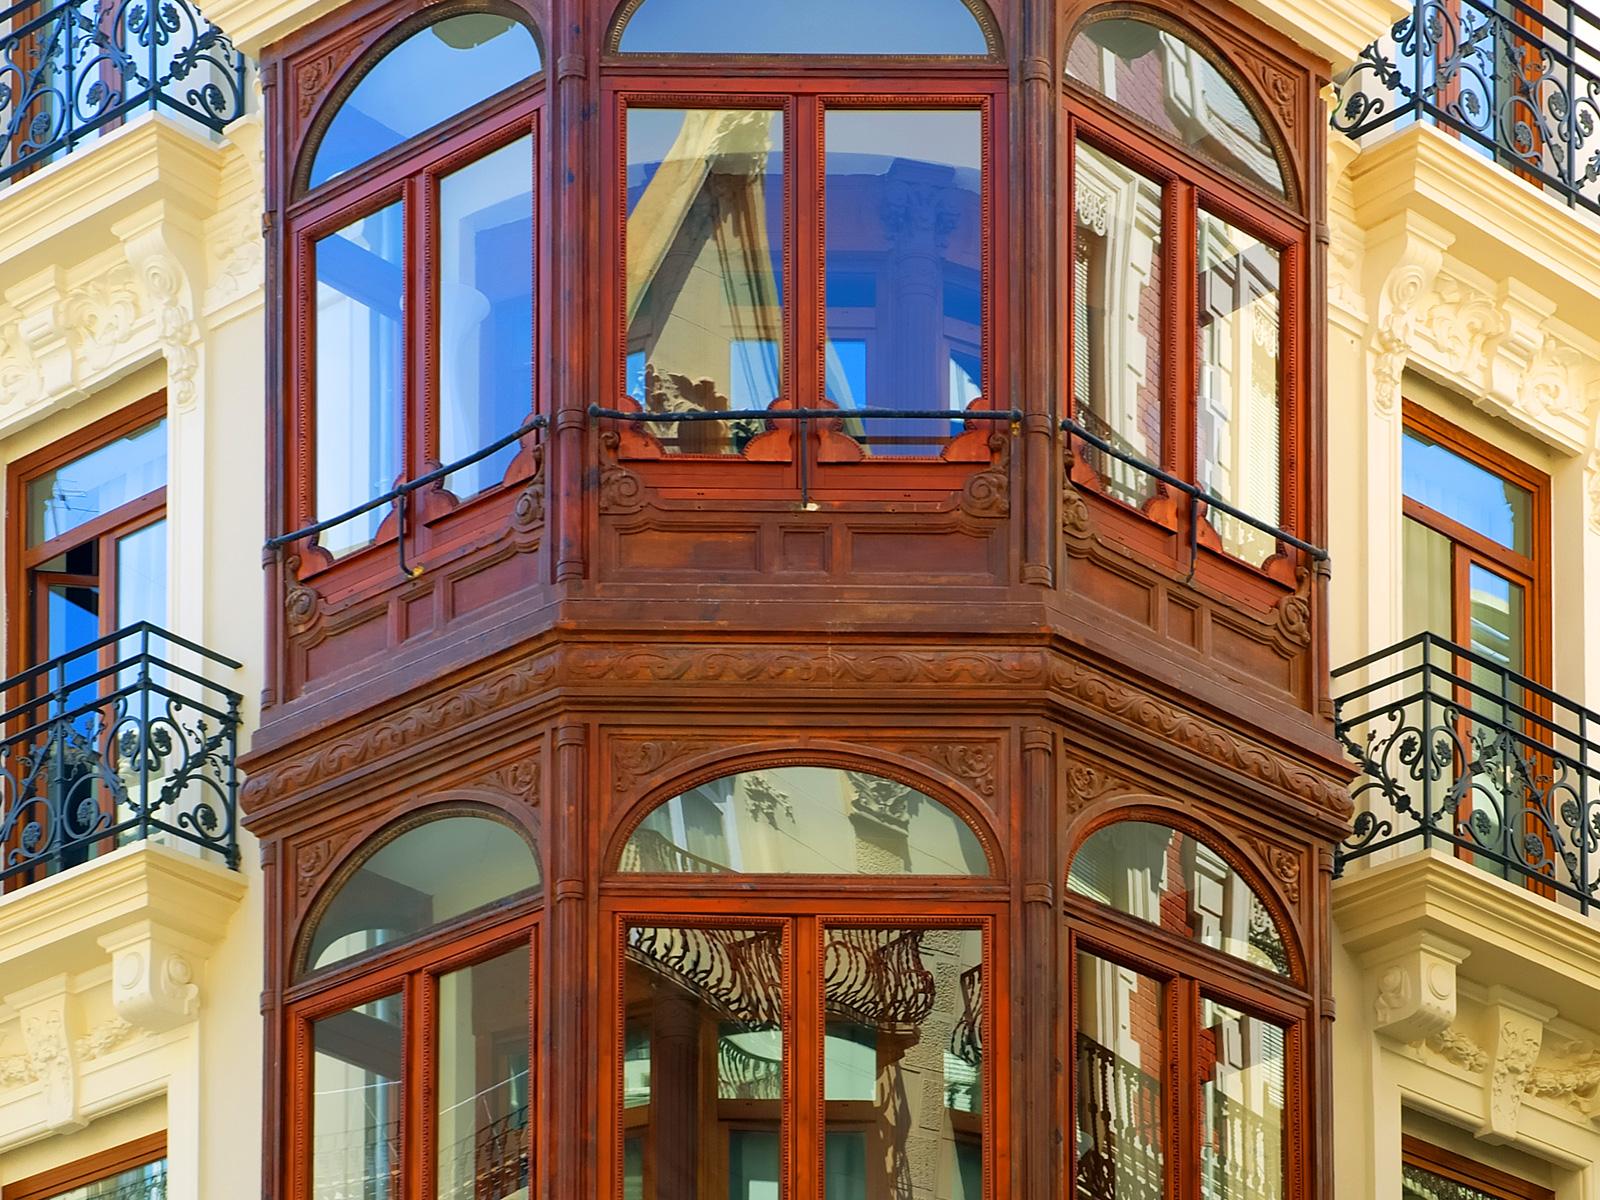 Fachada - Vincci Palace 4*